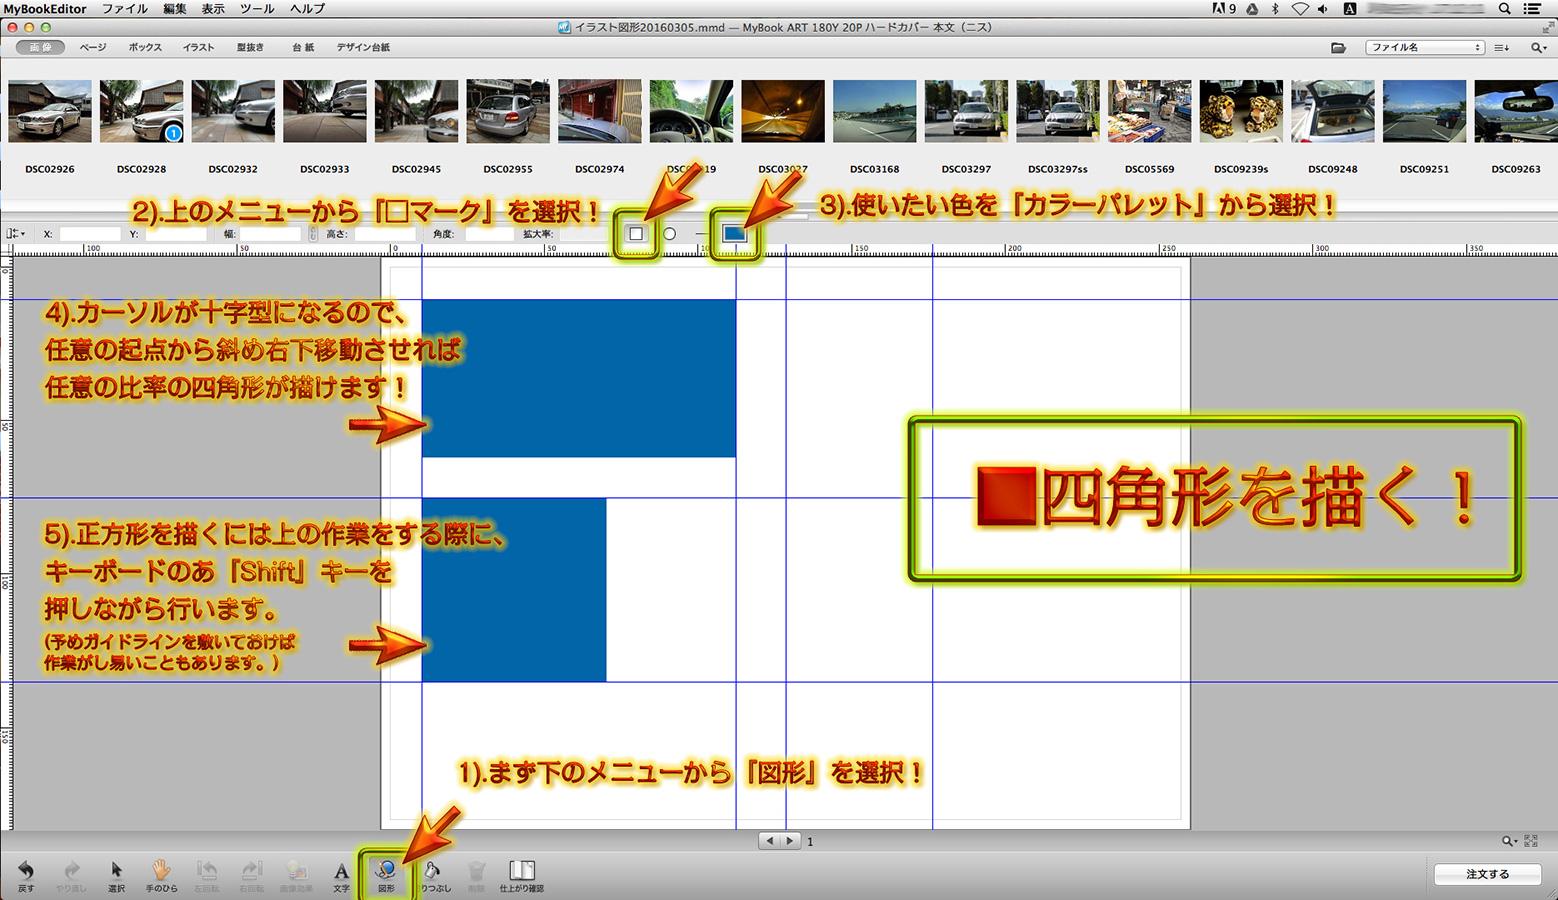 http://moritetsu.info/car/img/mb070-2016-03-08-17-12-11.jpg